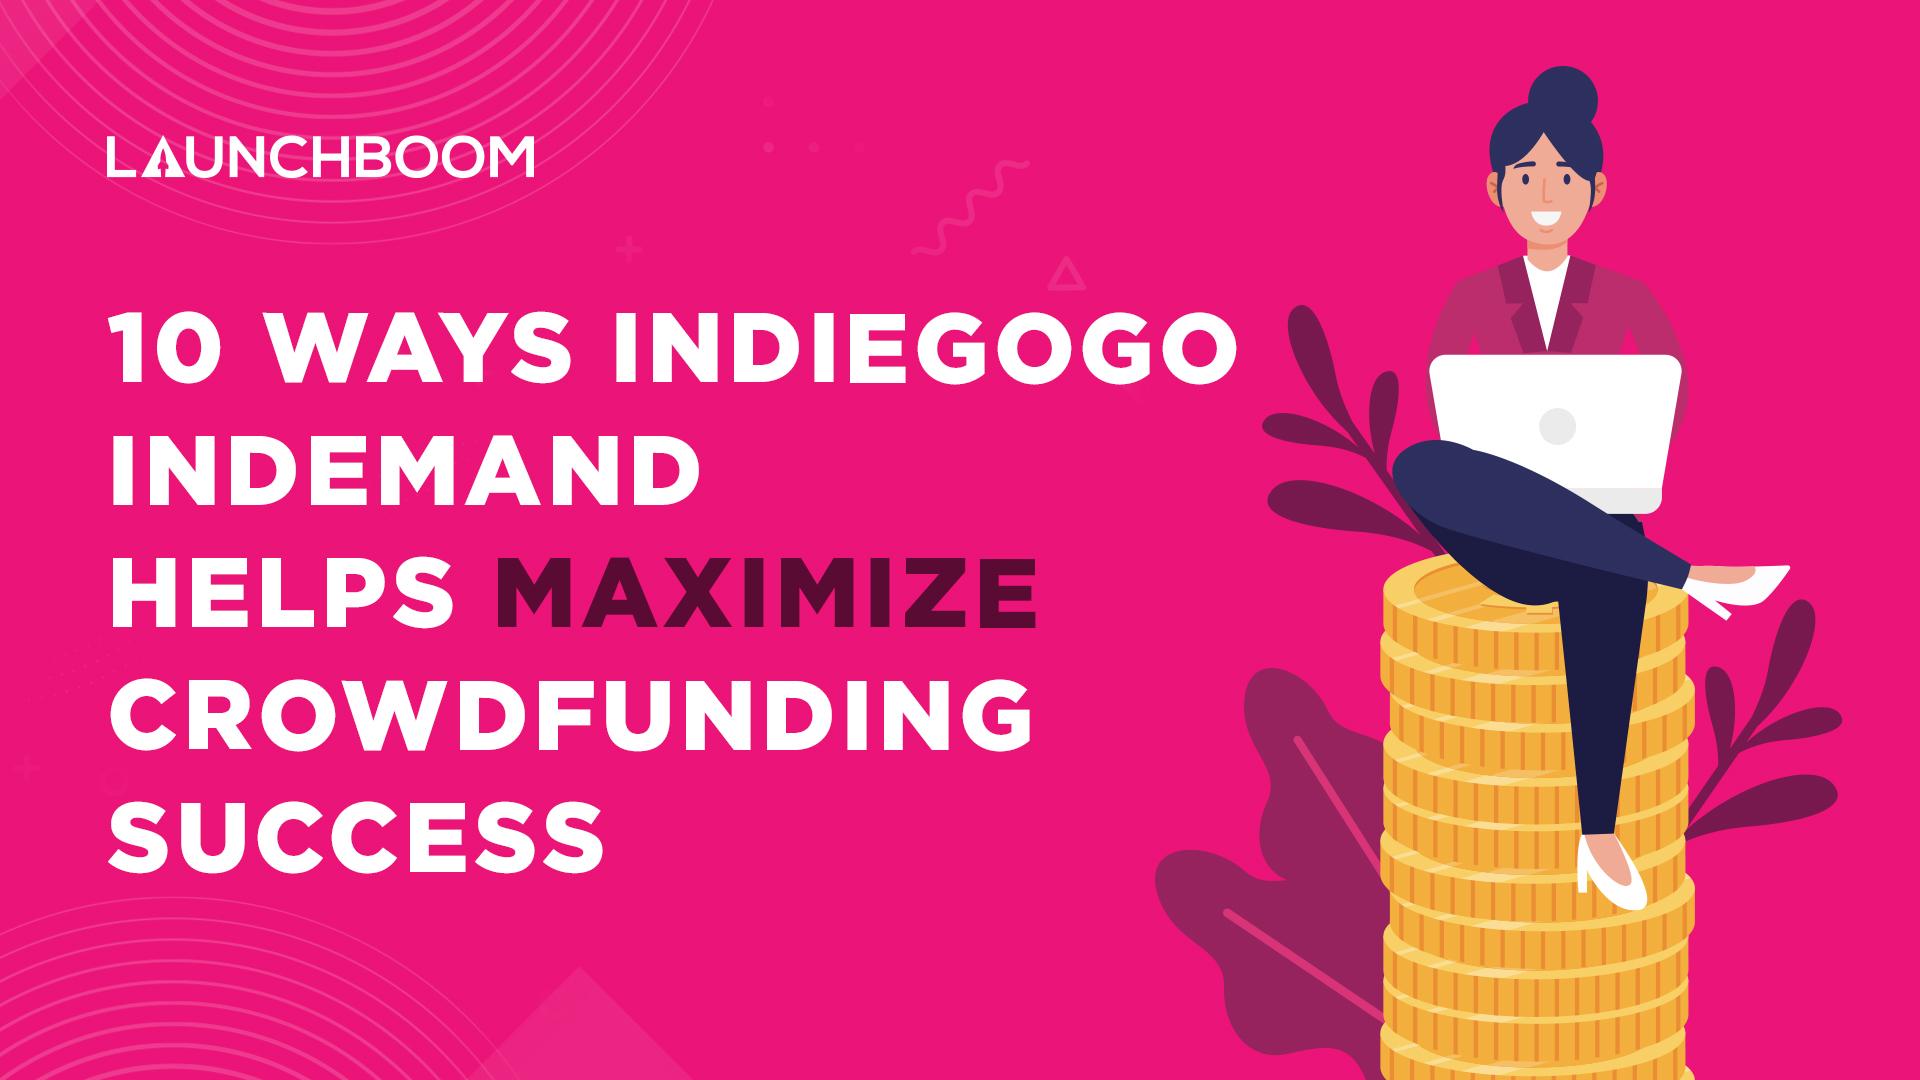 10 Ways Indiegogo InDemand Helps Maximize Crowdfunding Success